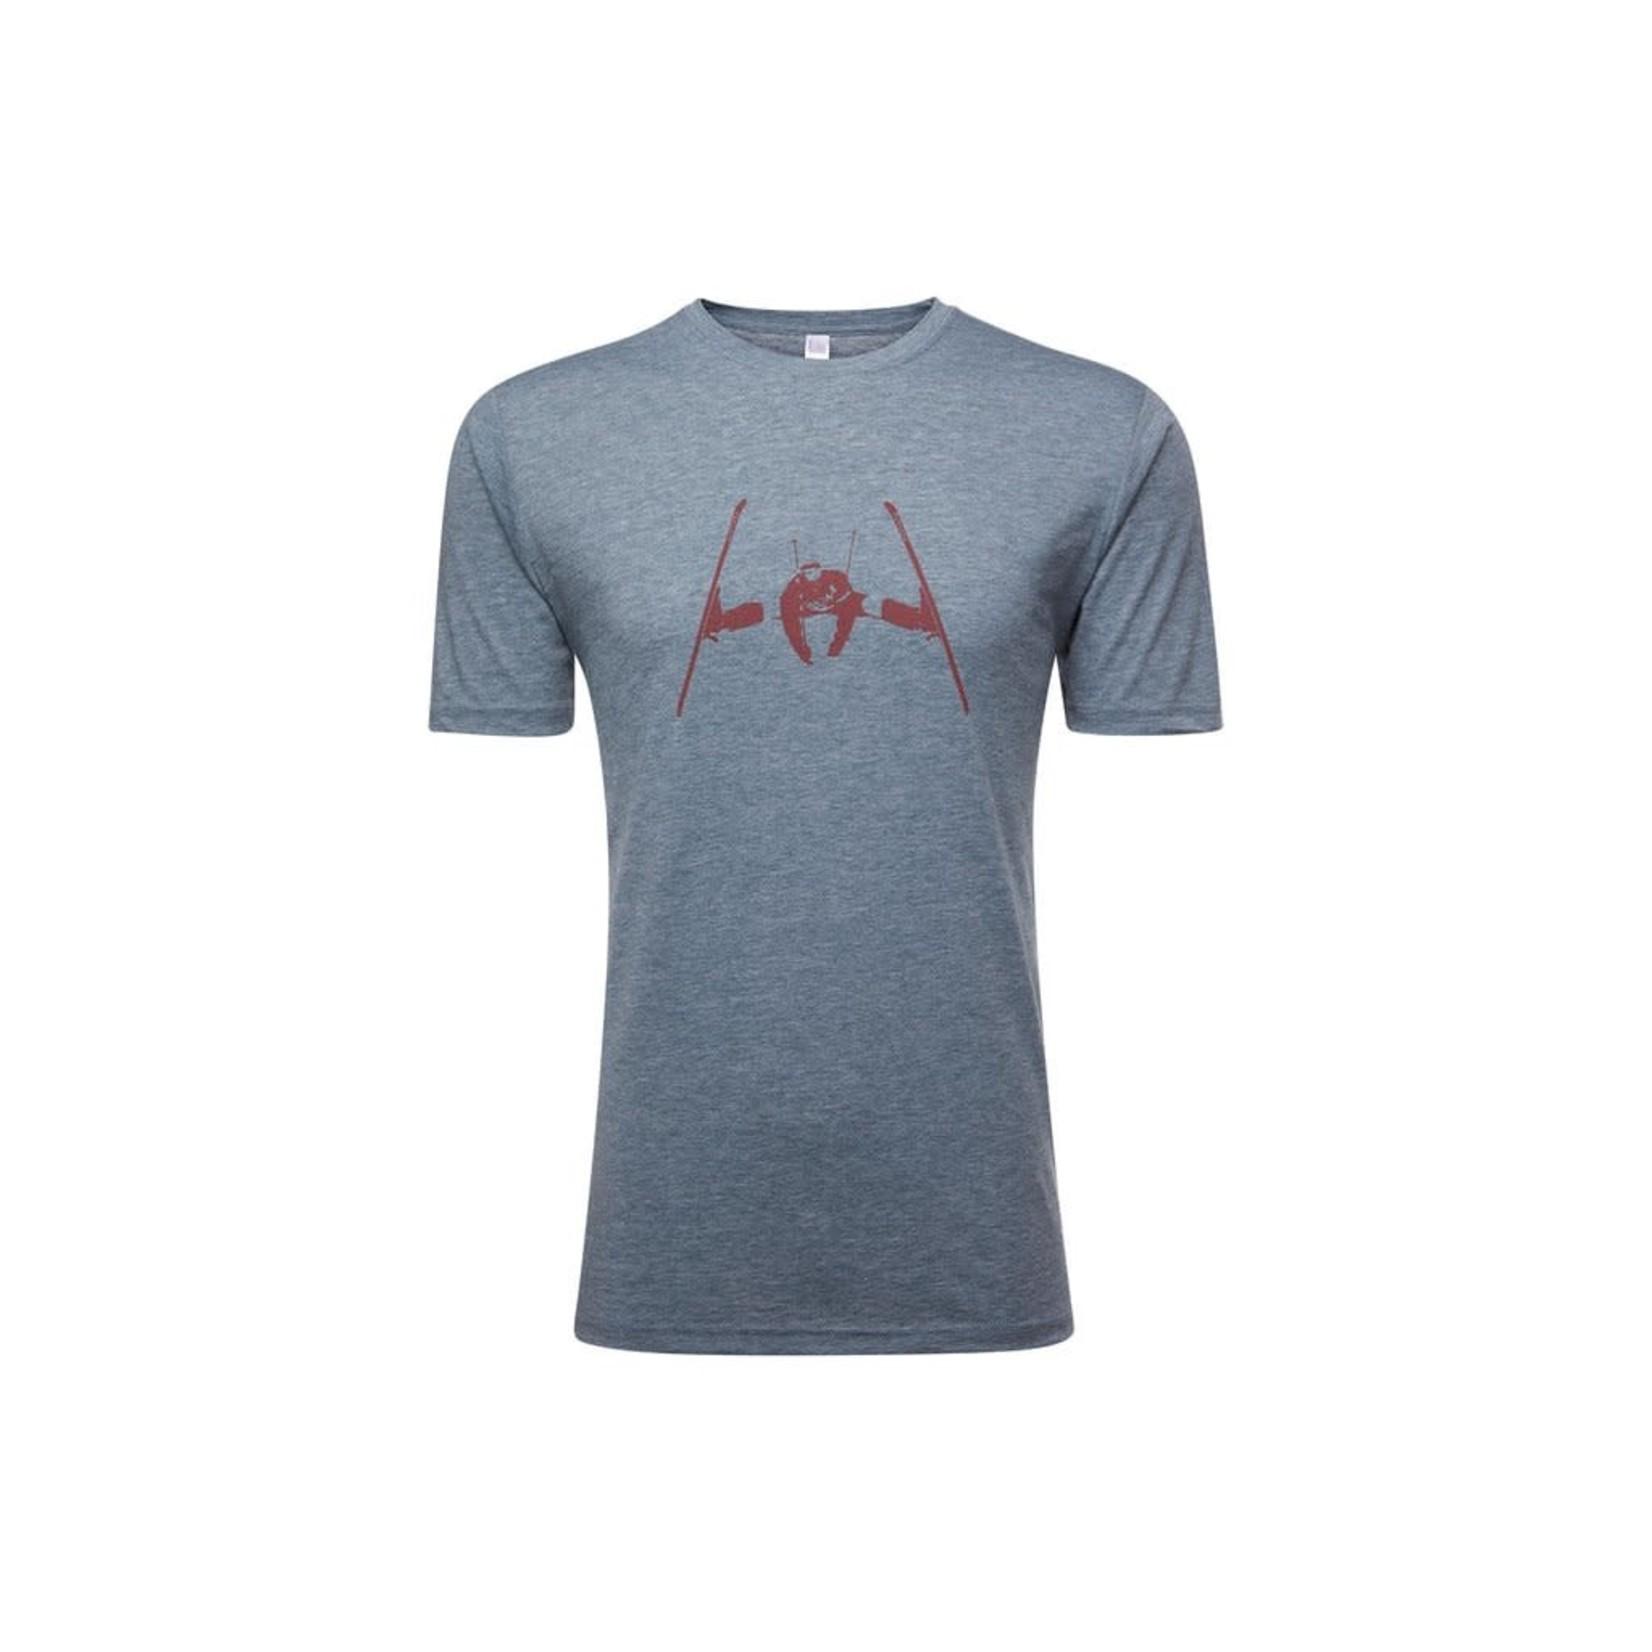 Flylow T-shirt Flylow Full Extension